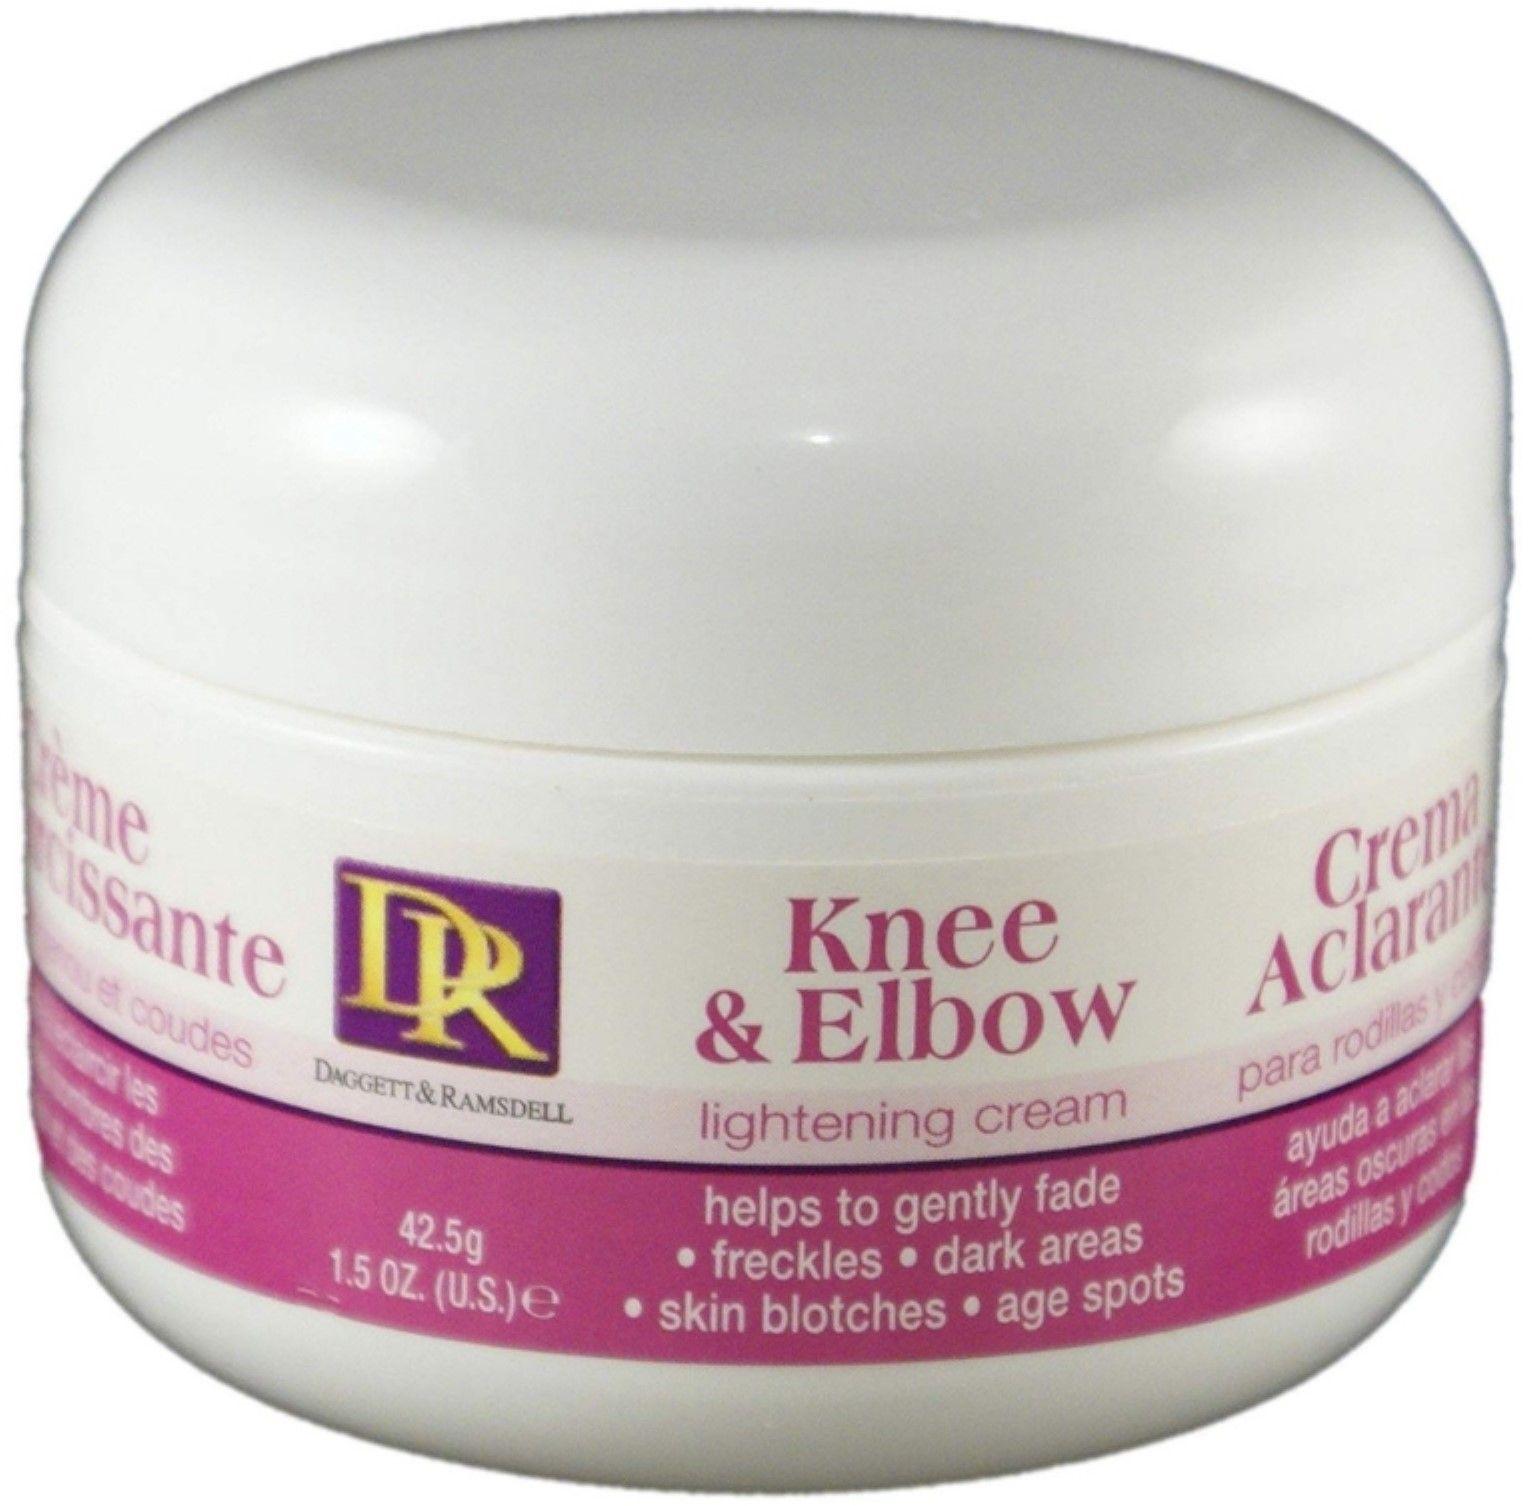 Dagget Ramsdell Knee Elbow Lightening Cream 1 5 Oz Walmart Com Lightening Creams Skin Blotches Lightening